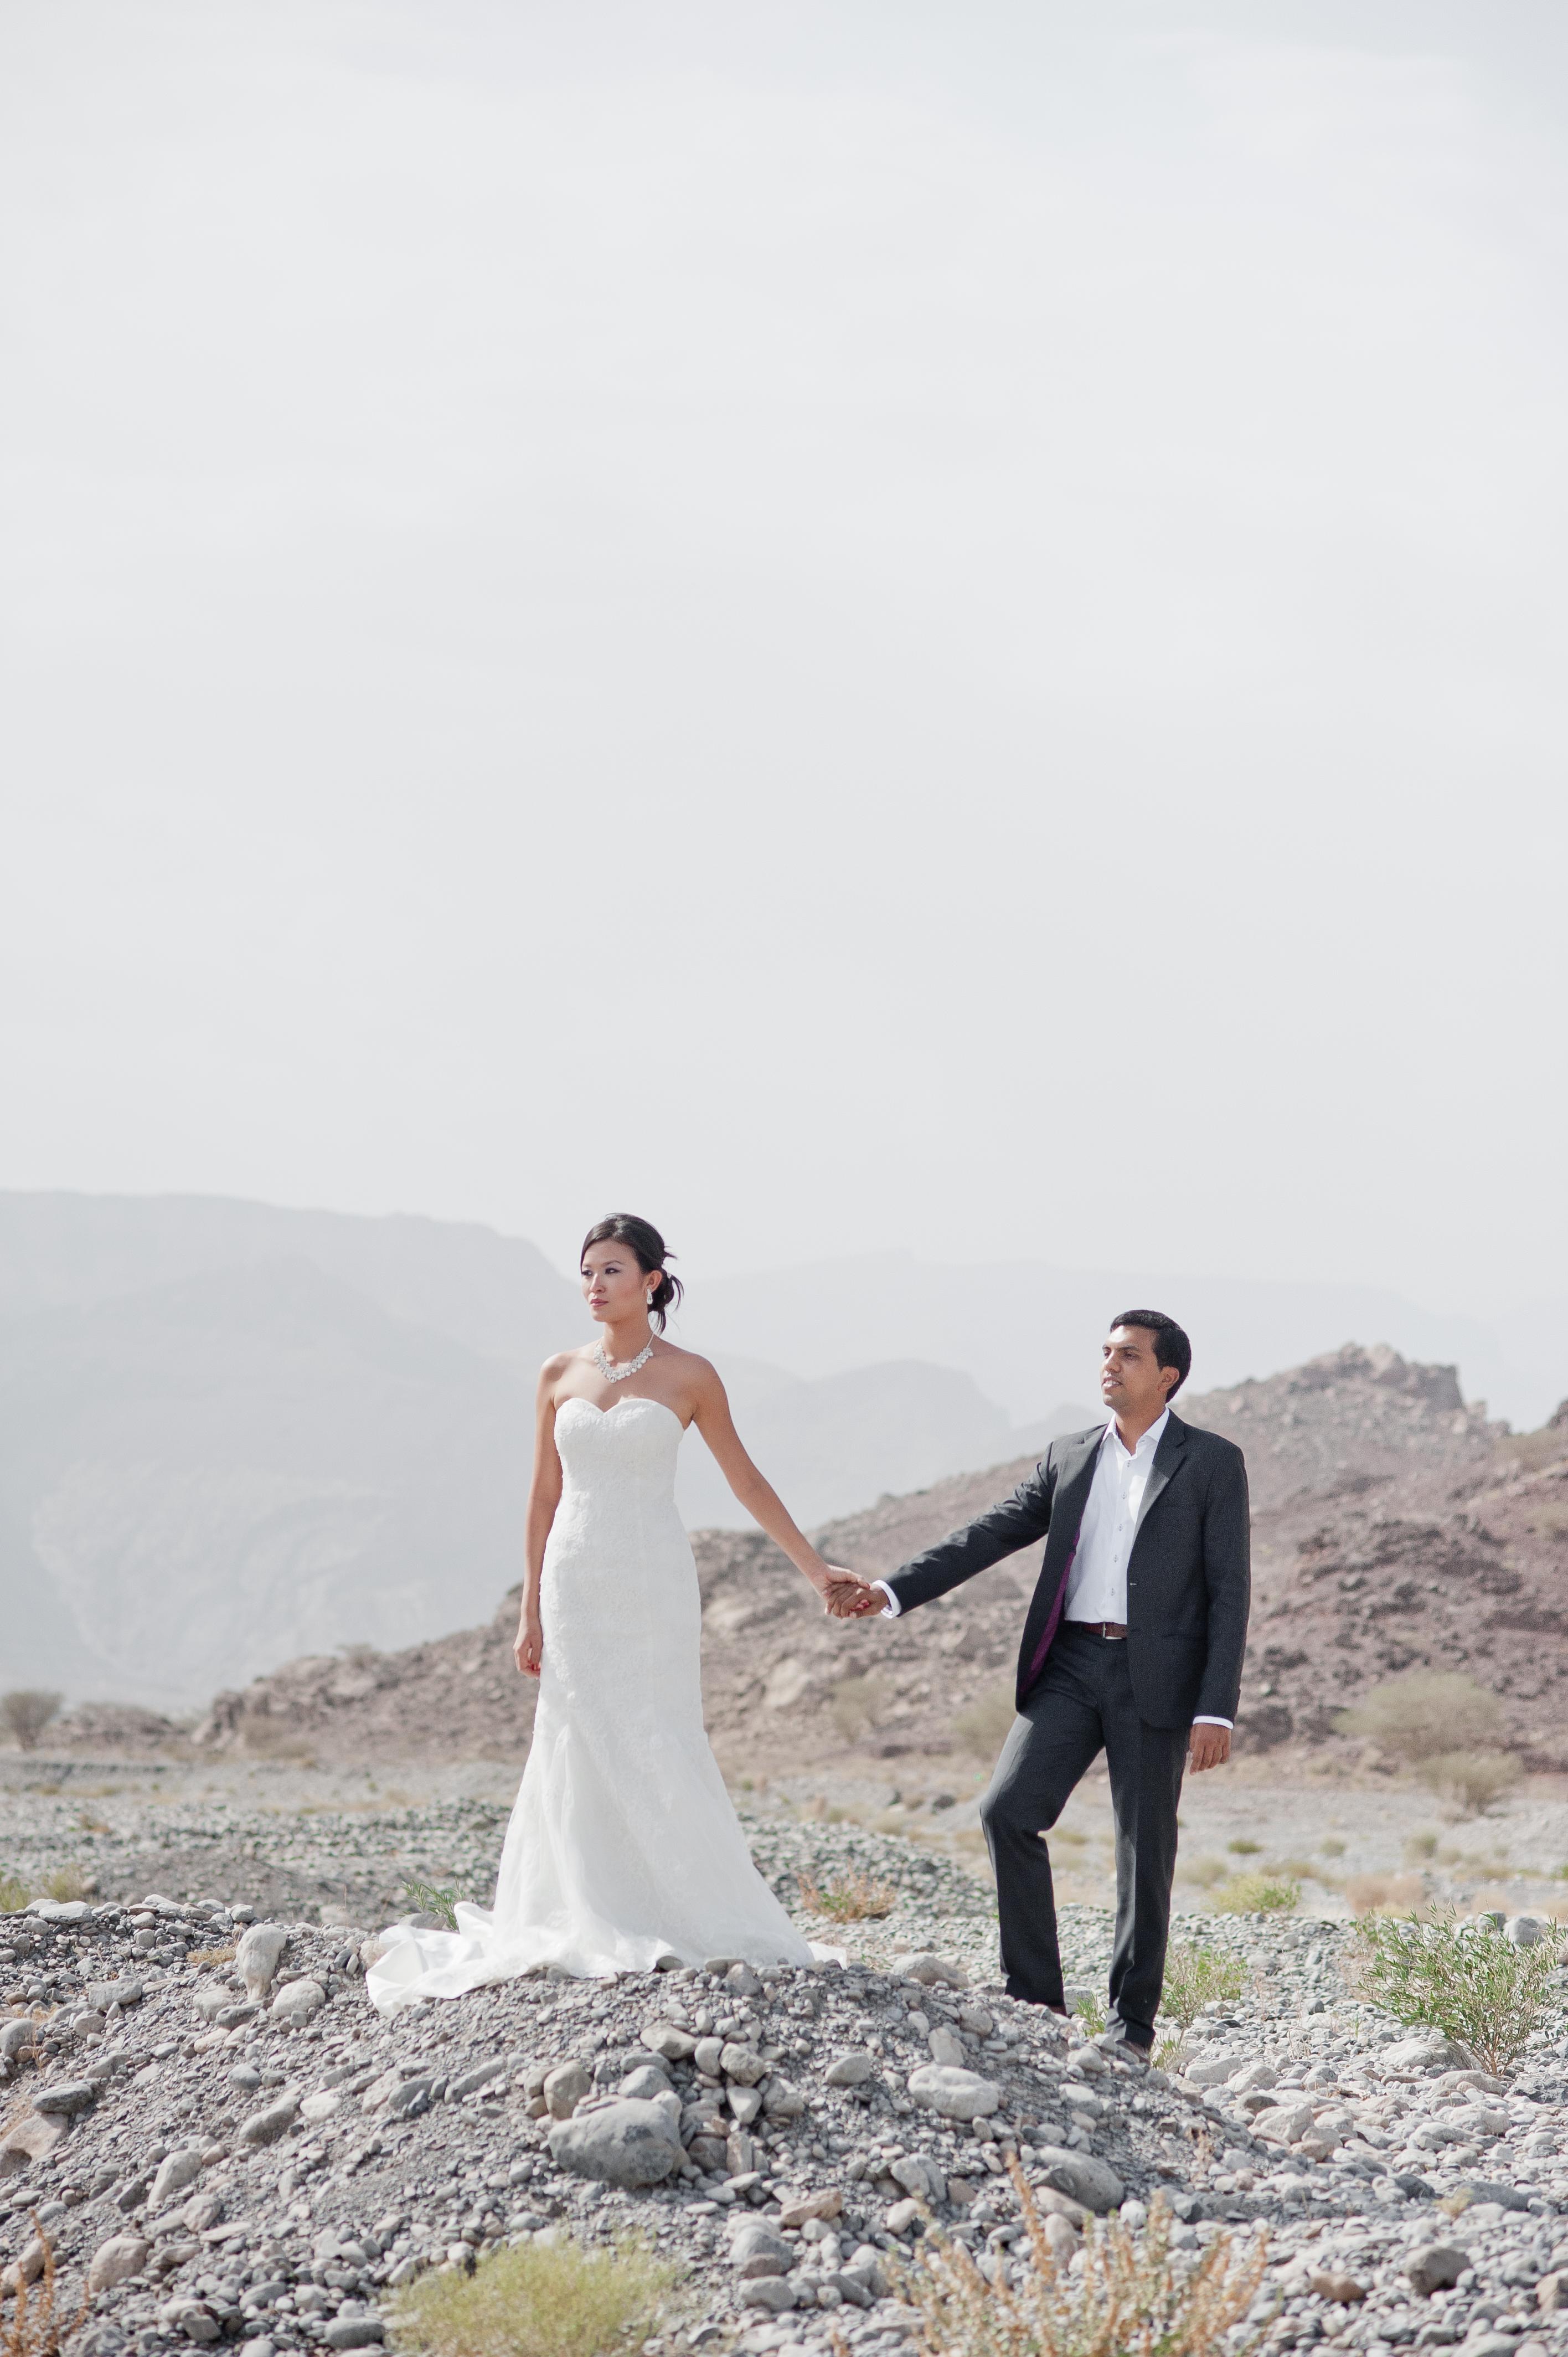 Oman-Wedding-Photographer-007